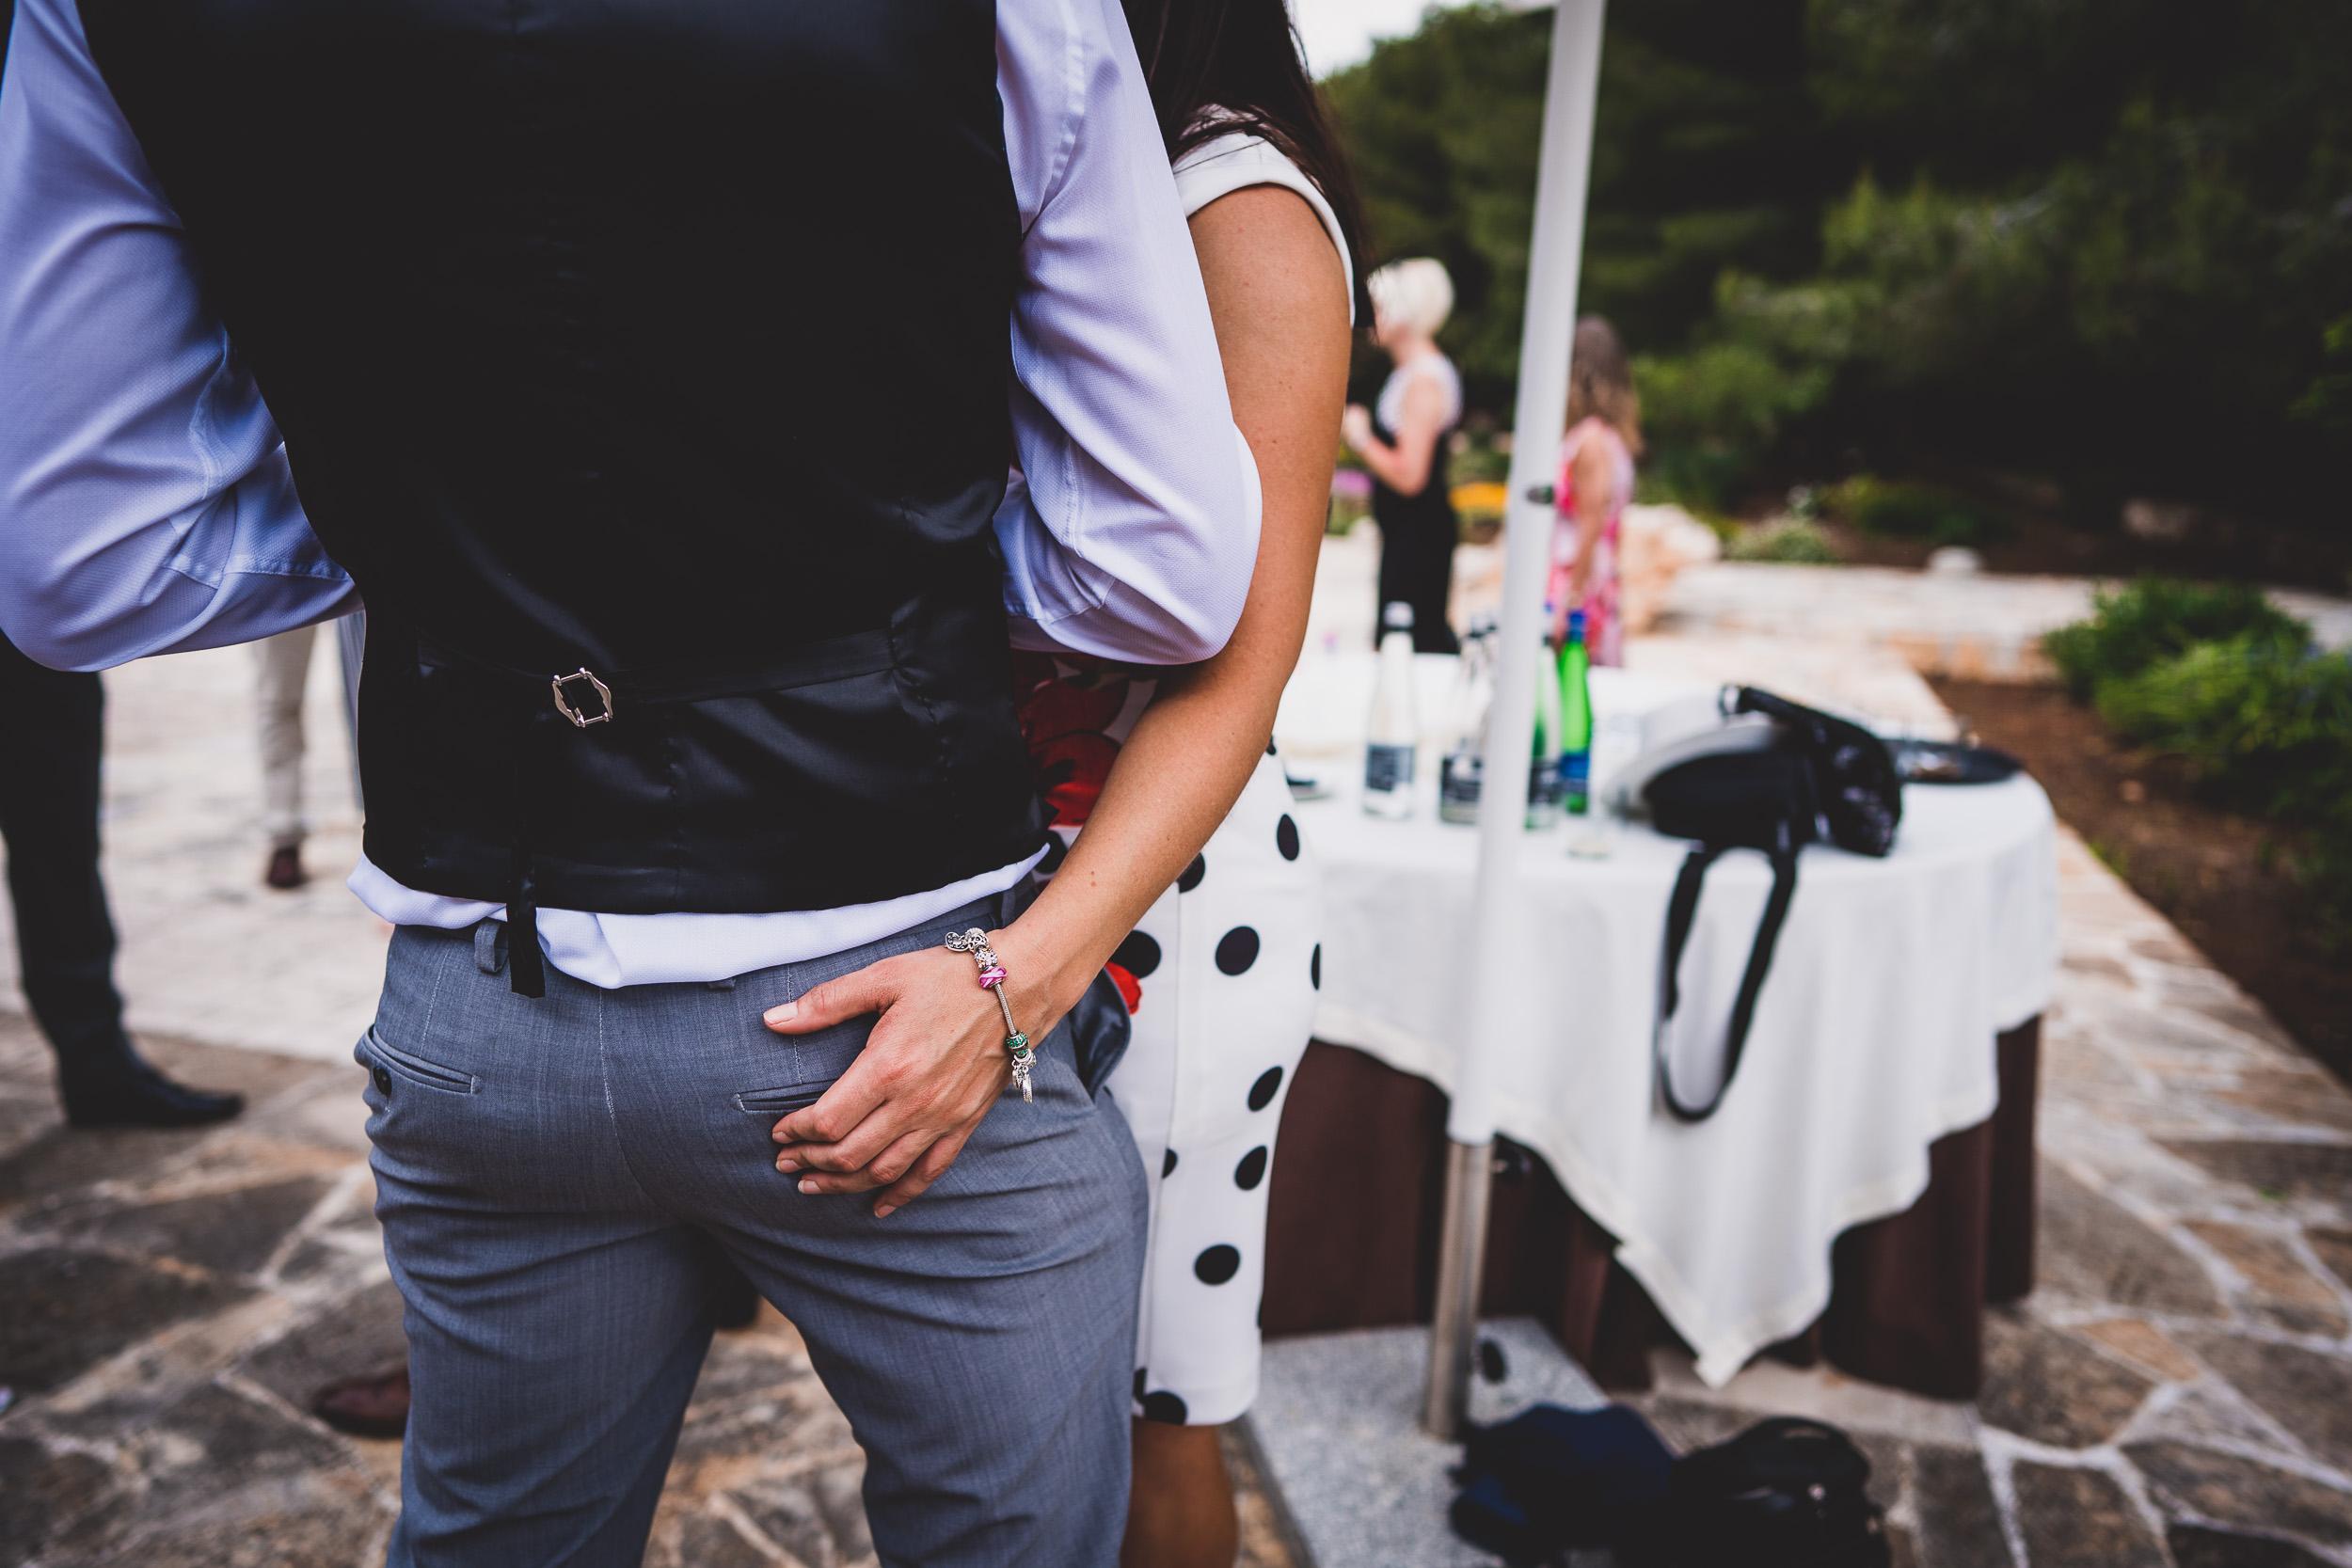 Destination wedding photography | Anna & Nigel destination wedding photography 022